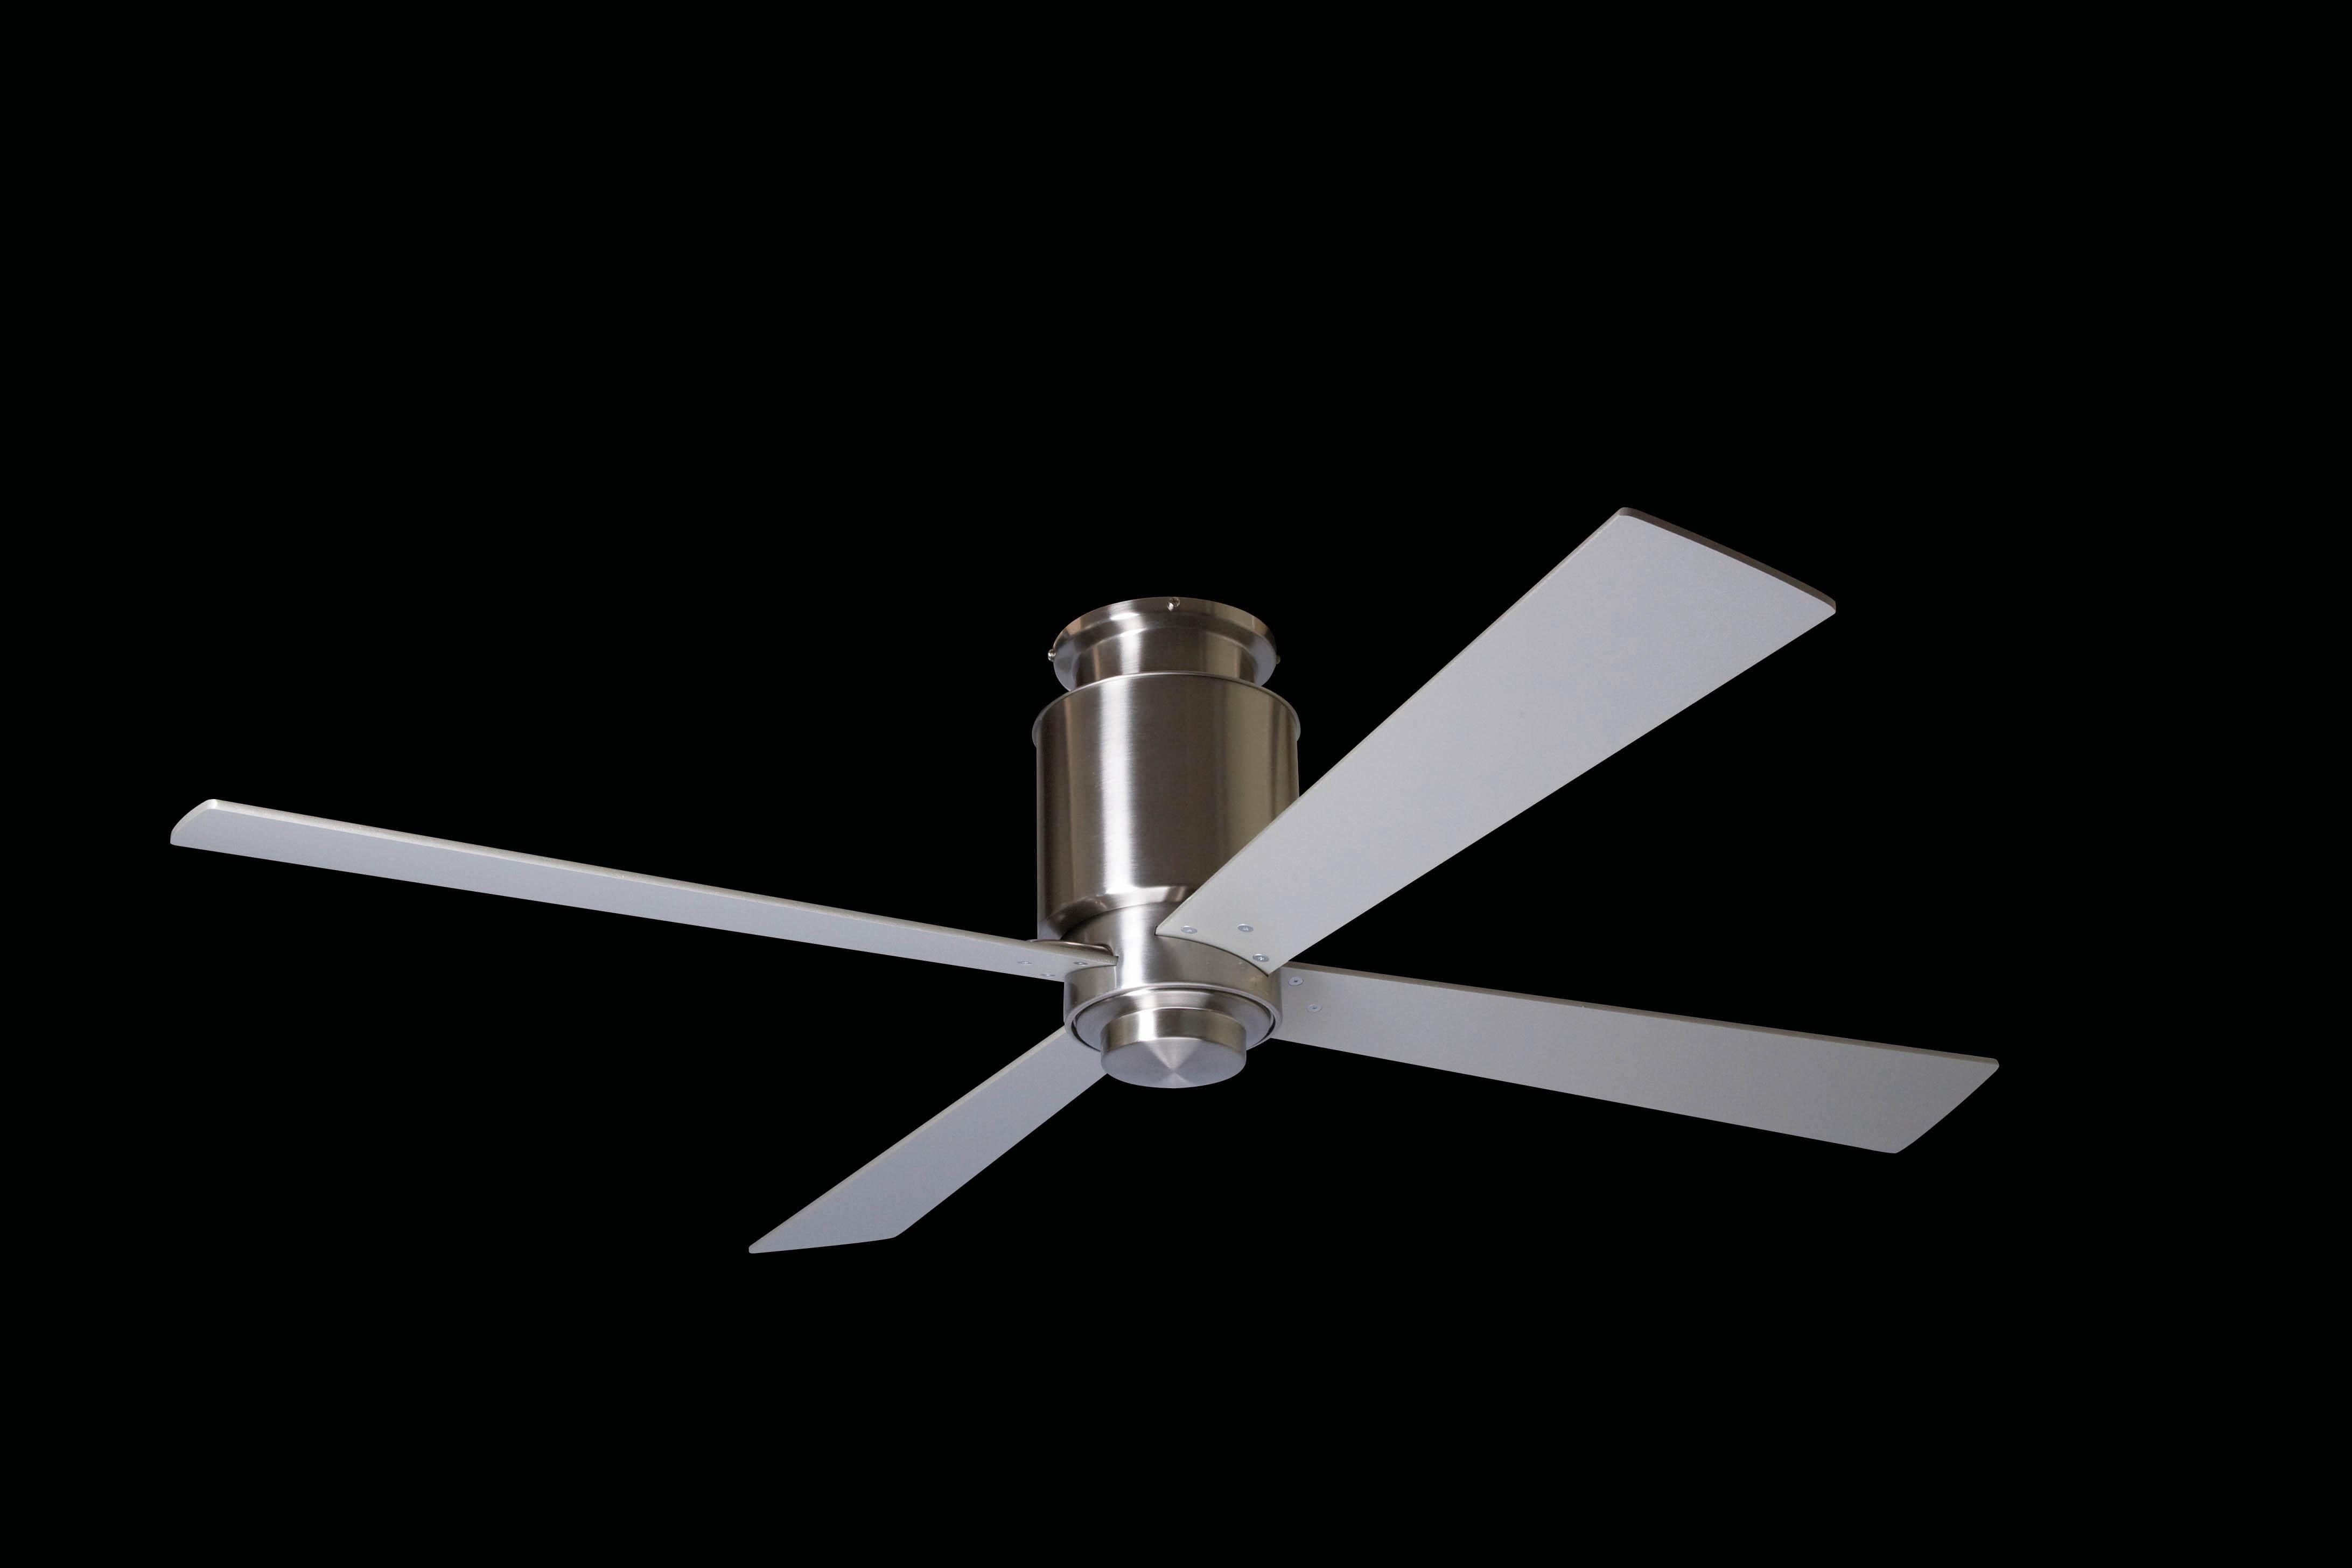 "MODERN FAN EU LAPA HUGGER LAPHUG-BN42BK550 42"" lesklý nikel/čierna Reverzný stropný ventilátor"